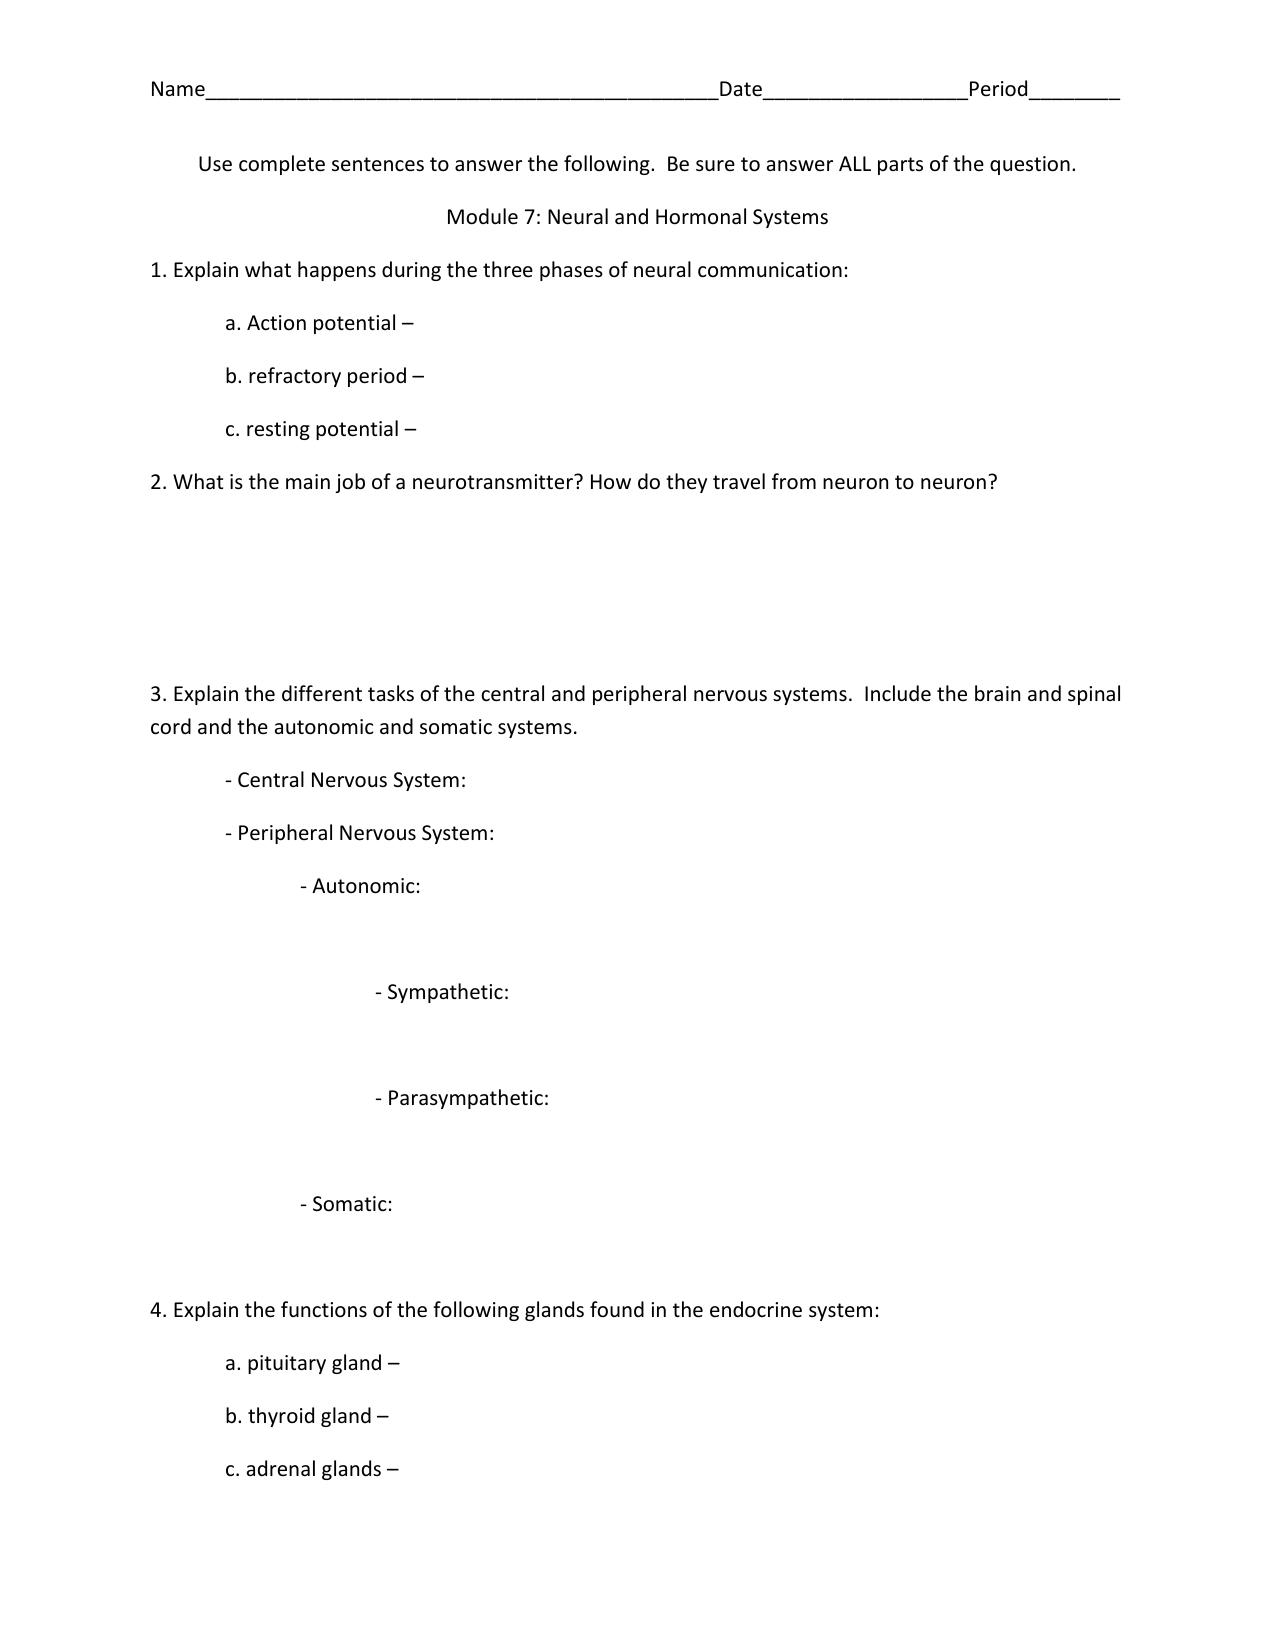 Module 7 And 8 Worksheet